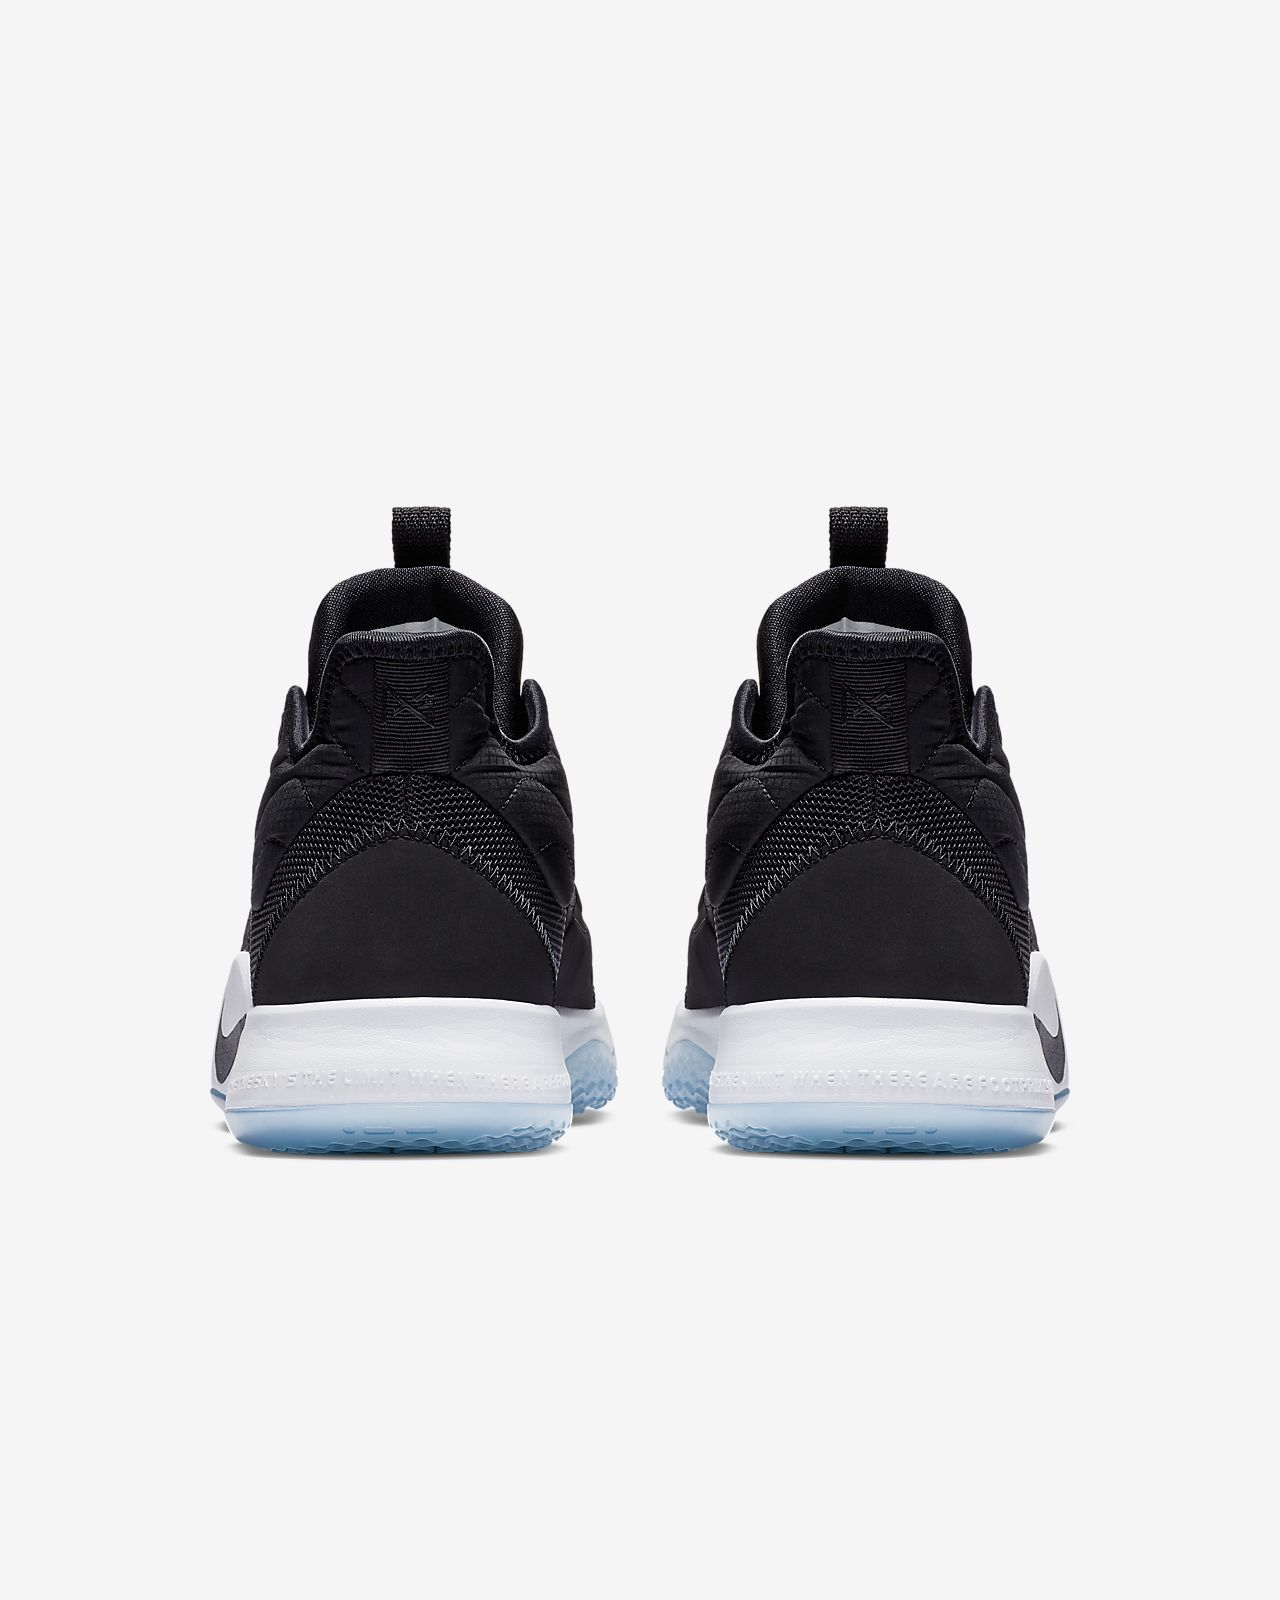 4167f7134627 Low Resolution PG 3 Basketball Shoe PG 3 Basketball Shoe